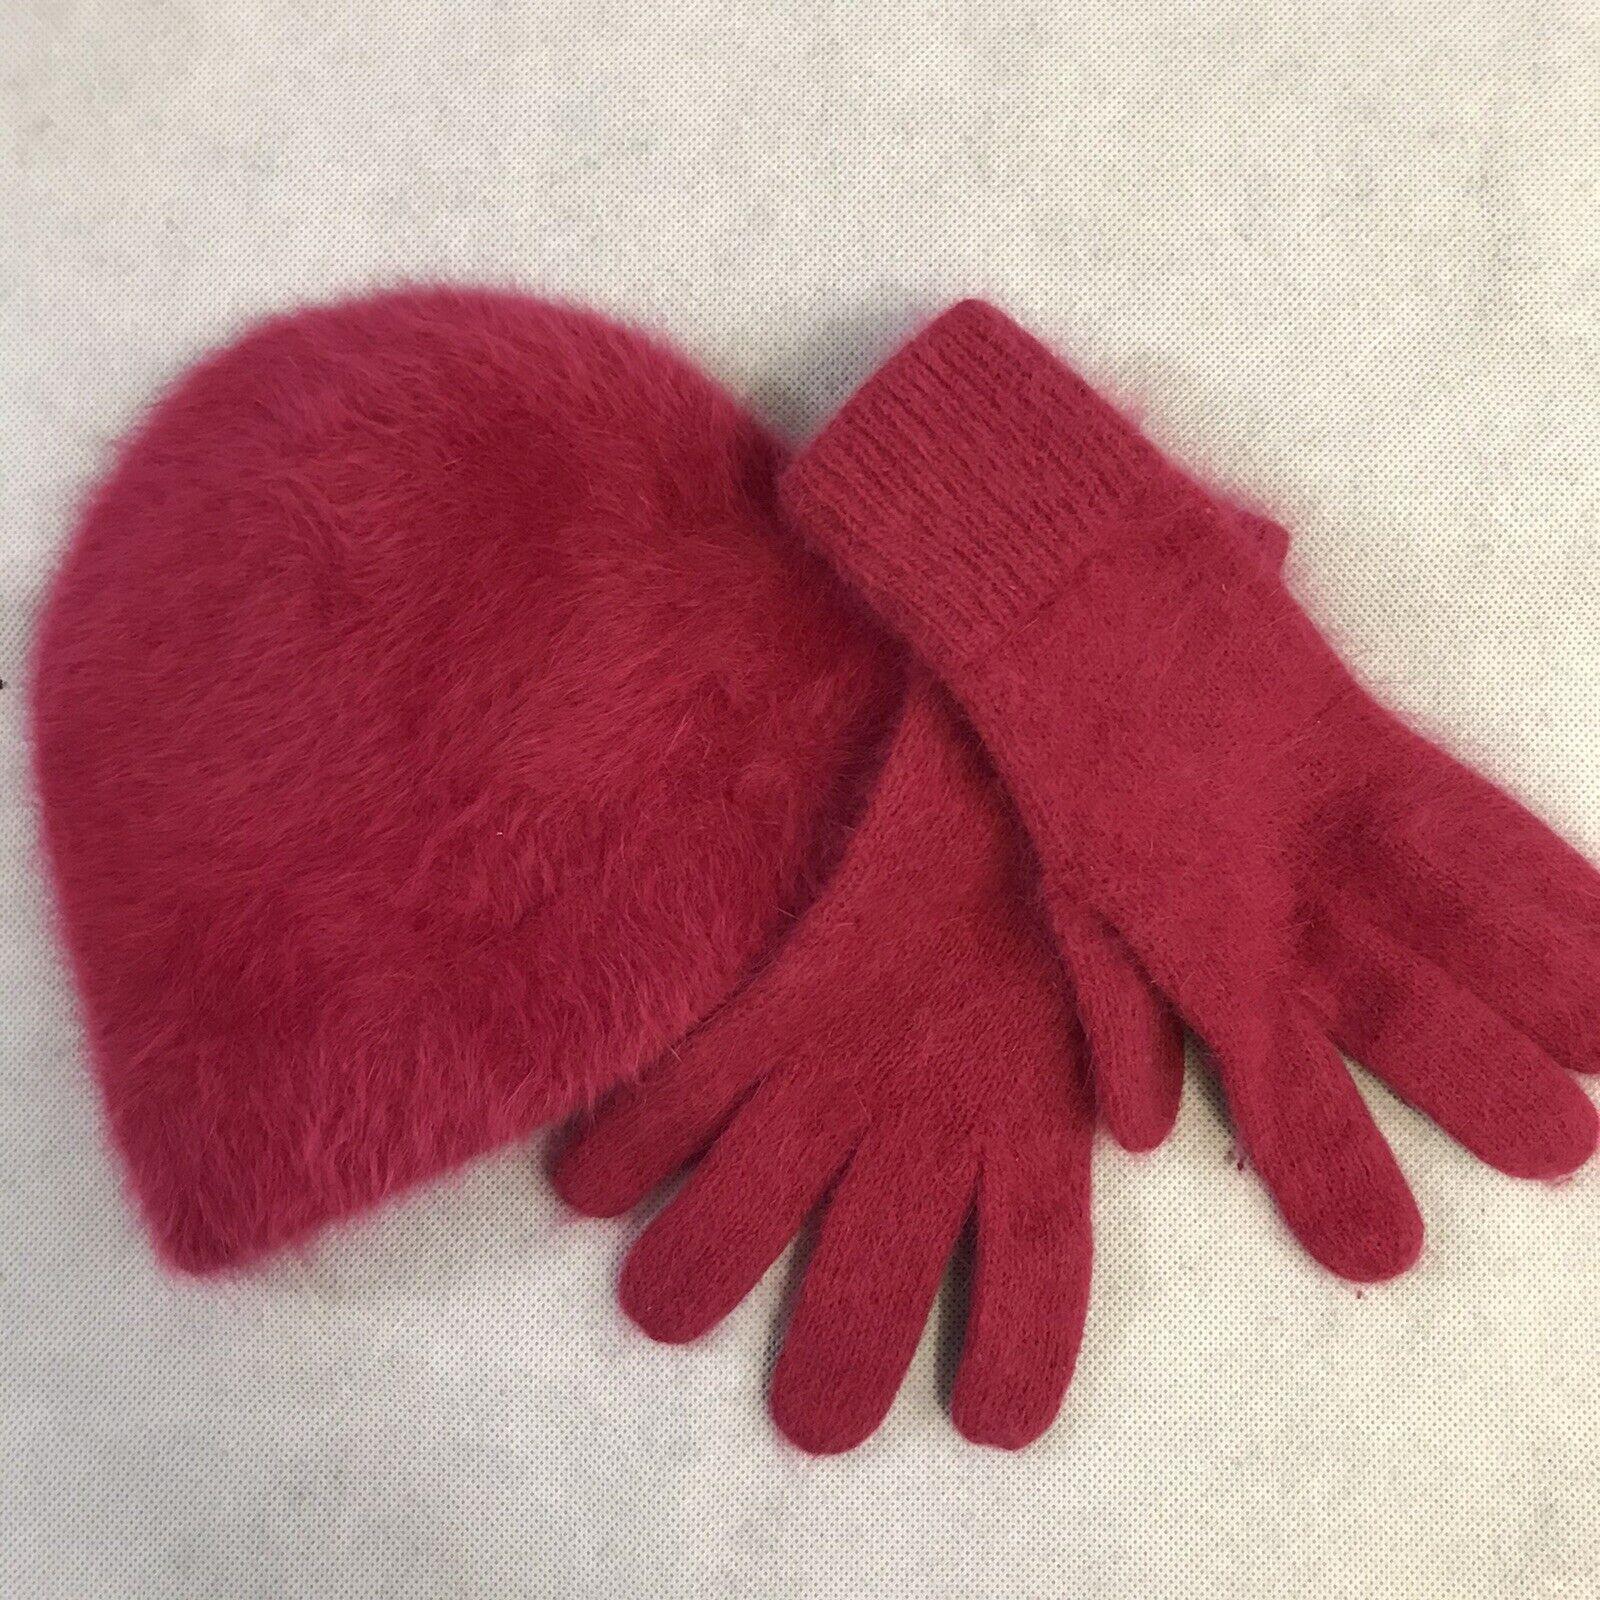 Hat and Glove Gloves SET Angora Rabbit Hair Wool Winter Soft Fluffy